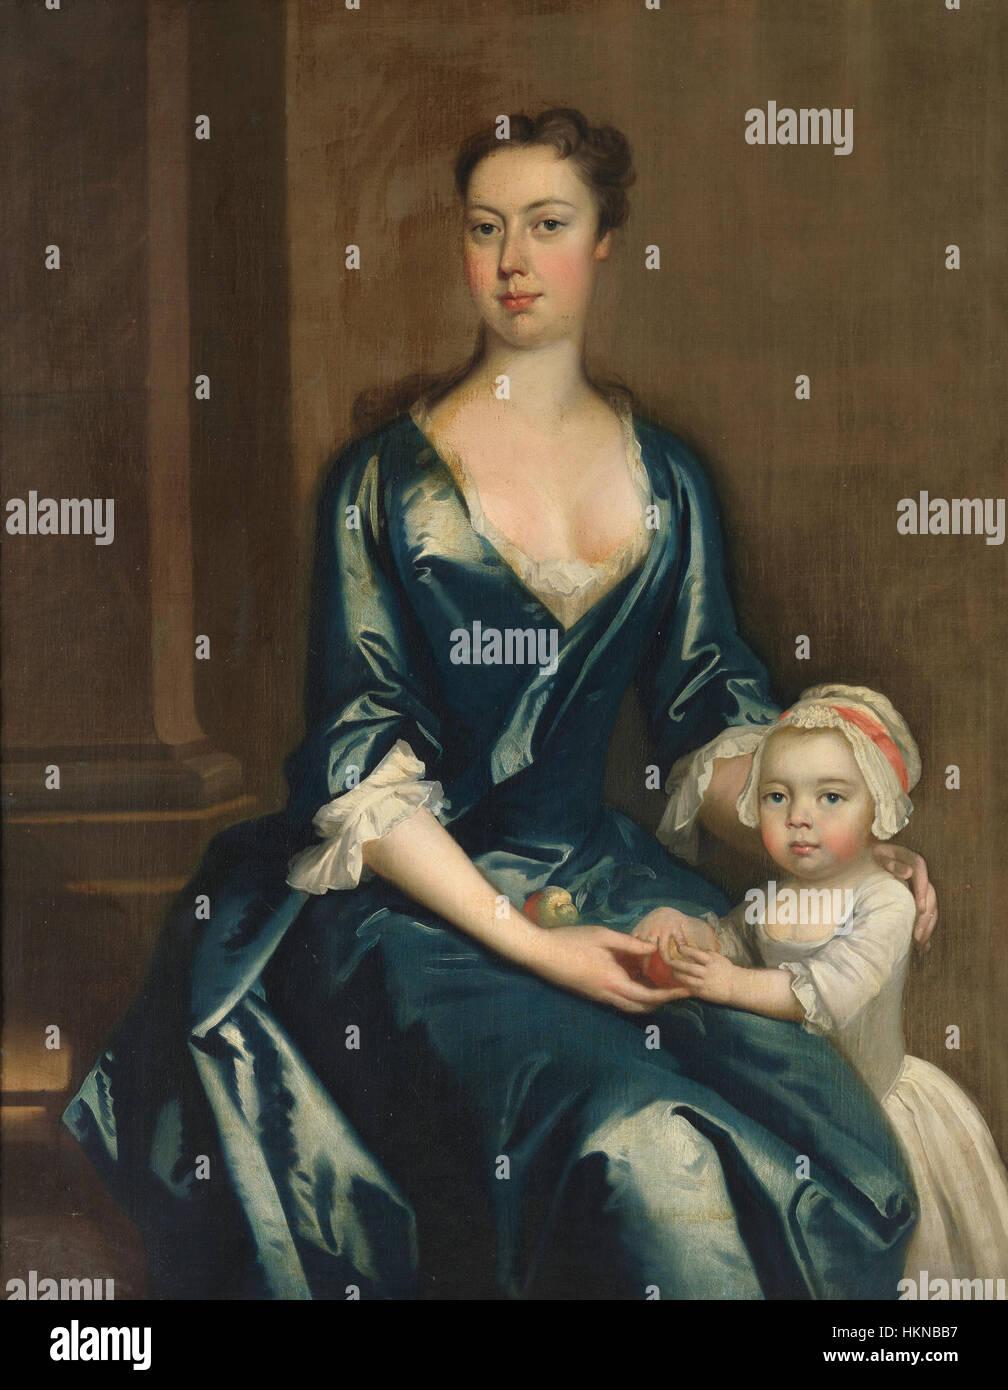 Retrato de dama con su hija (Thomas Hudson) Imagen De Stock